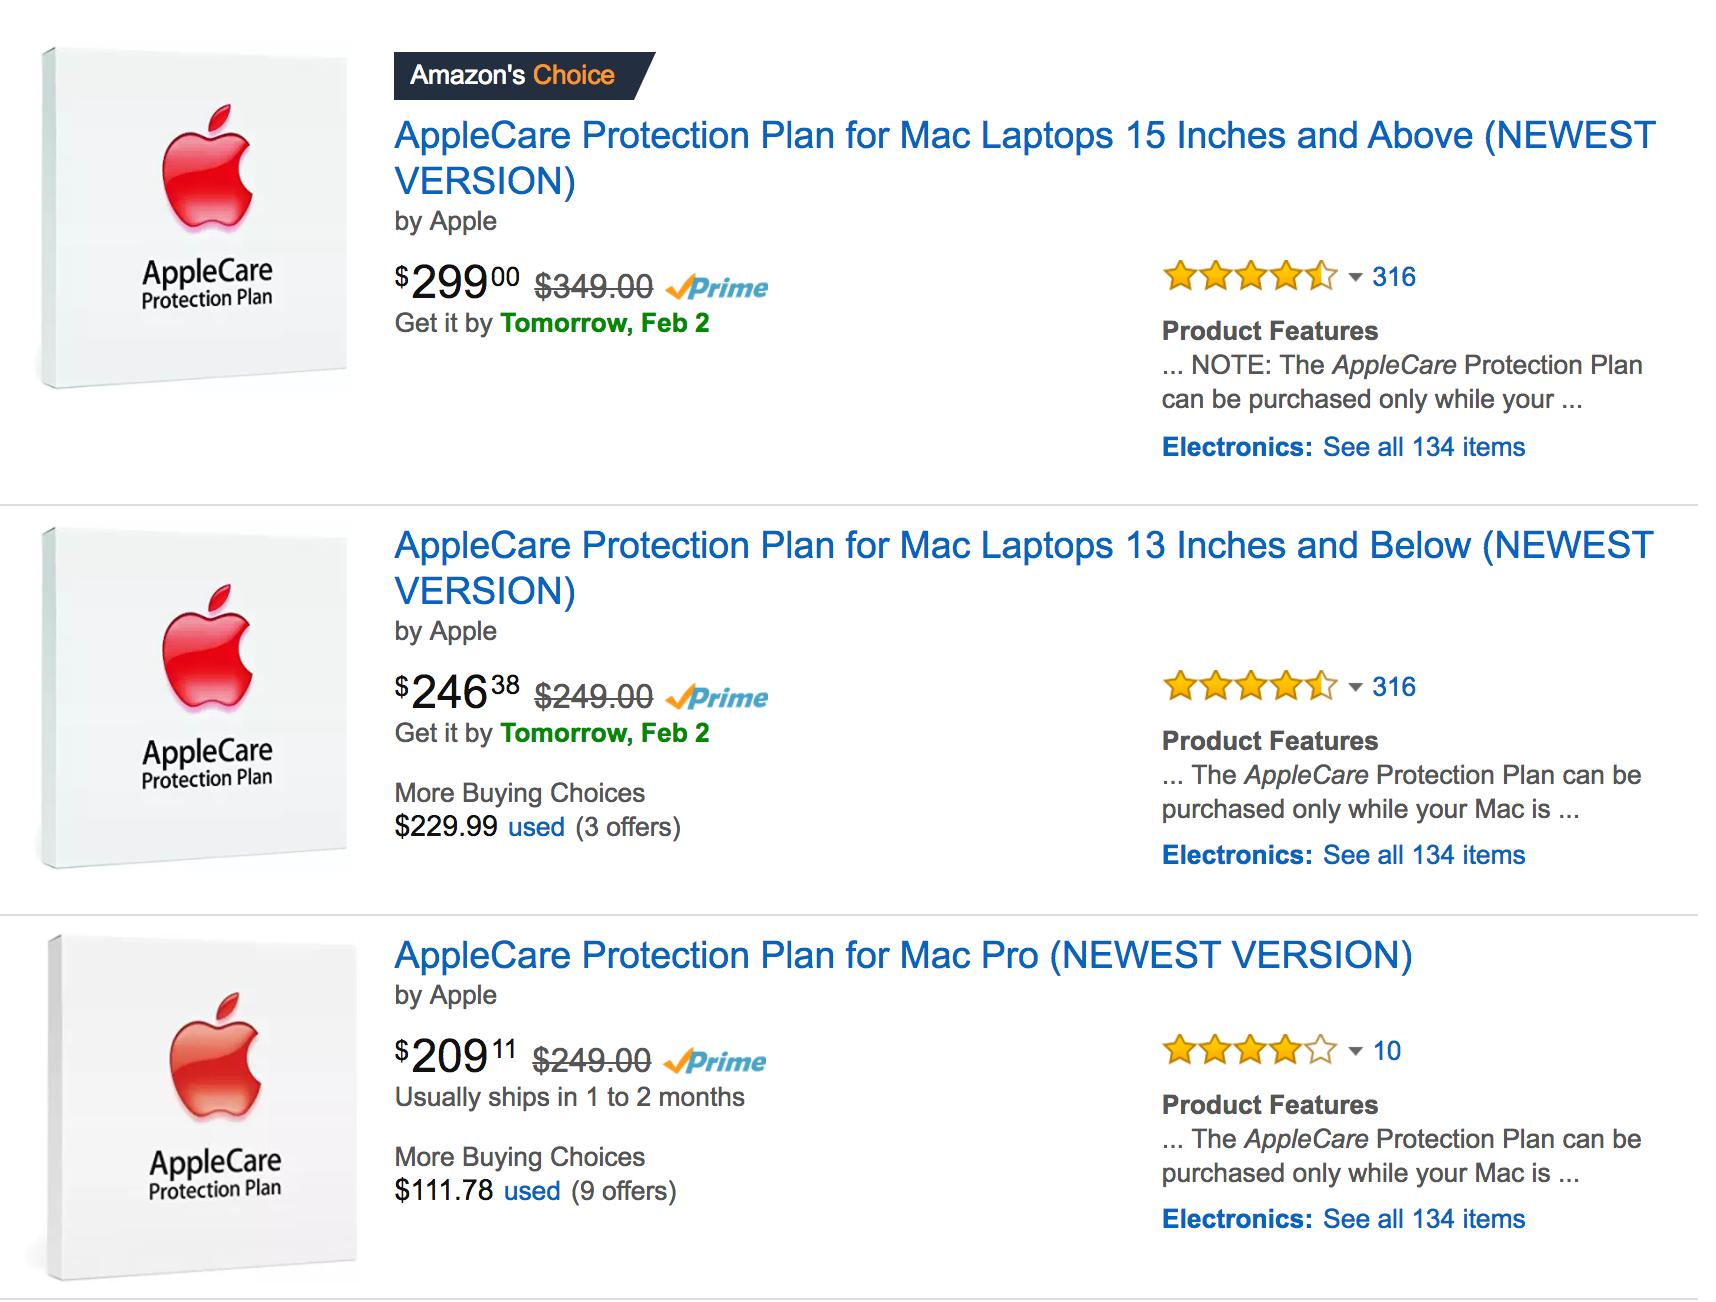 applecare options at amazon.com